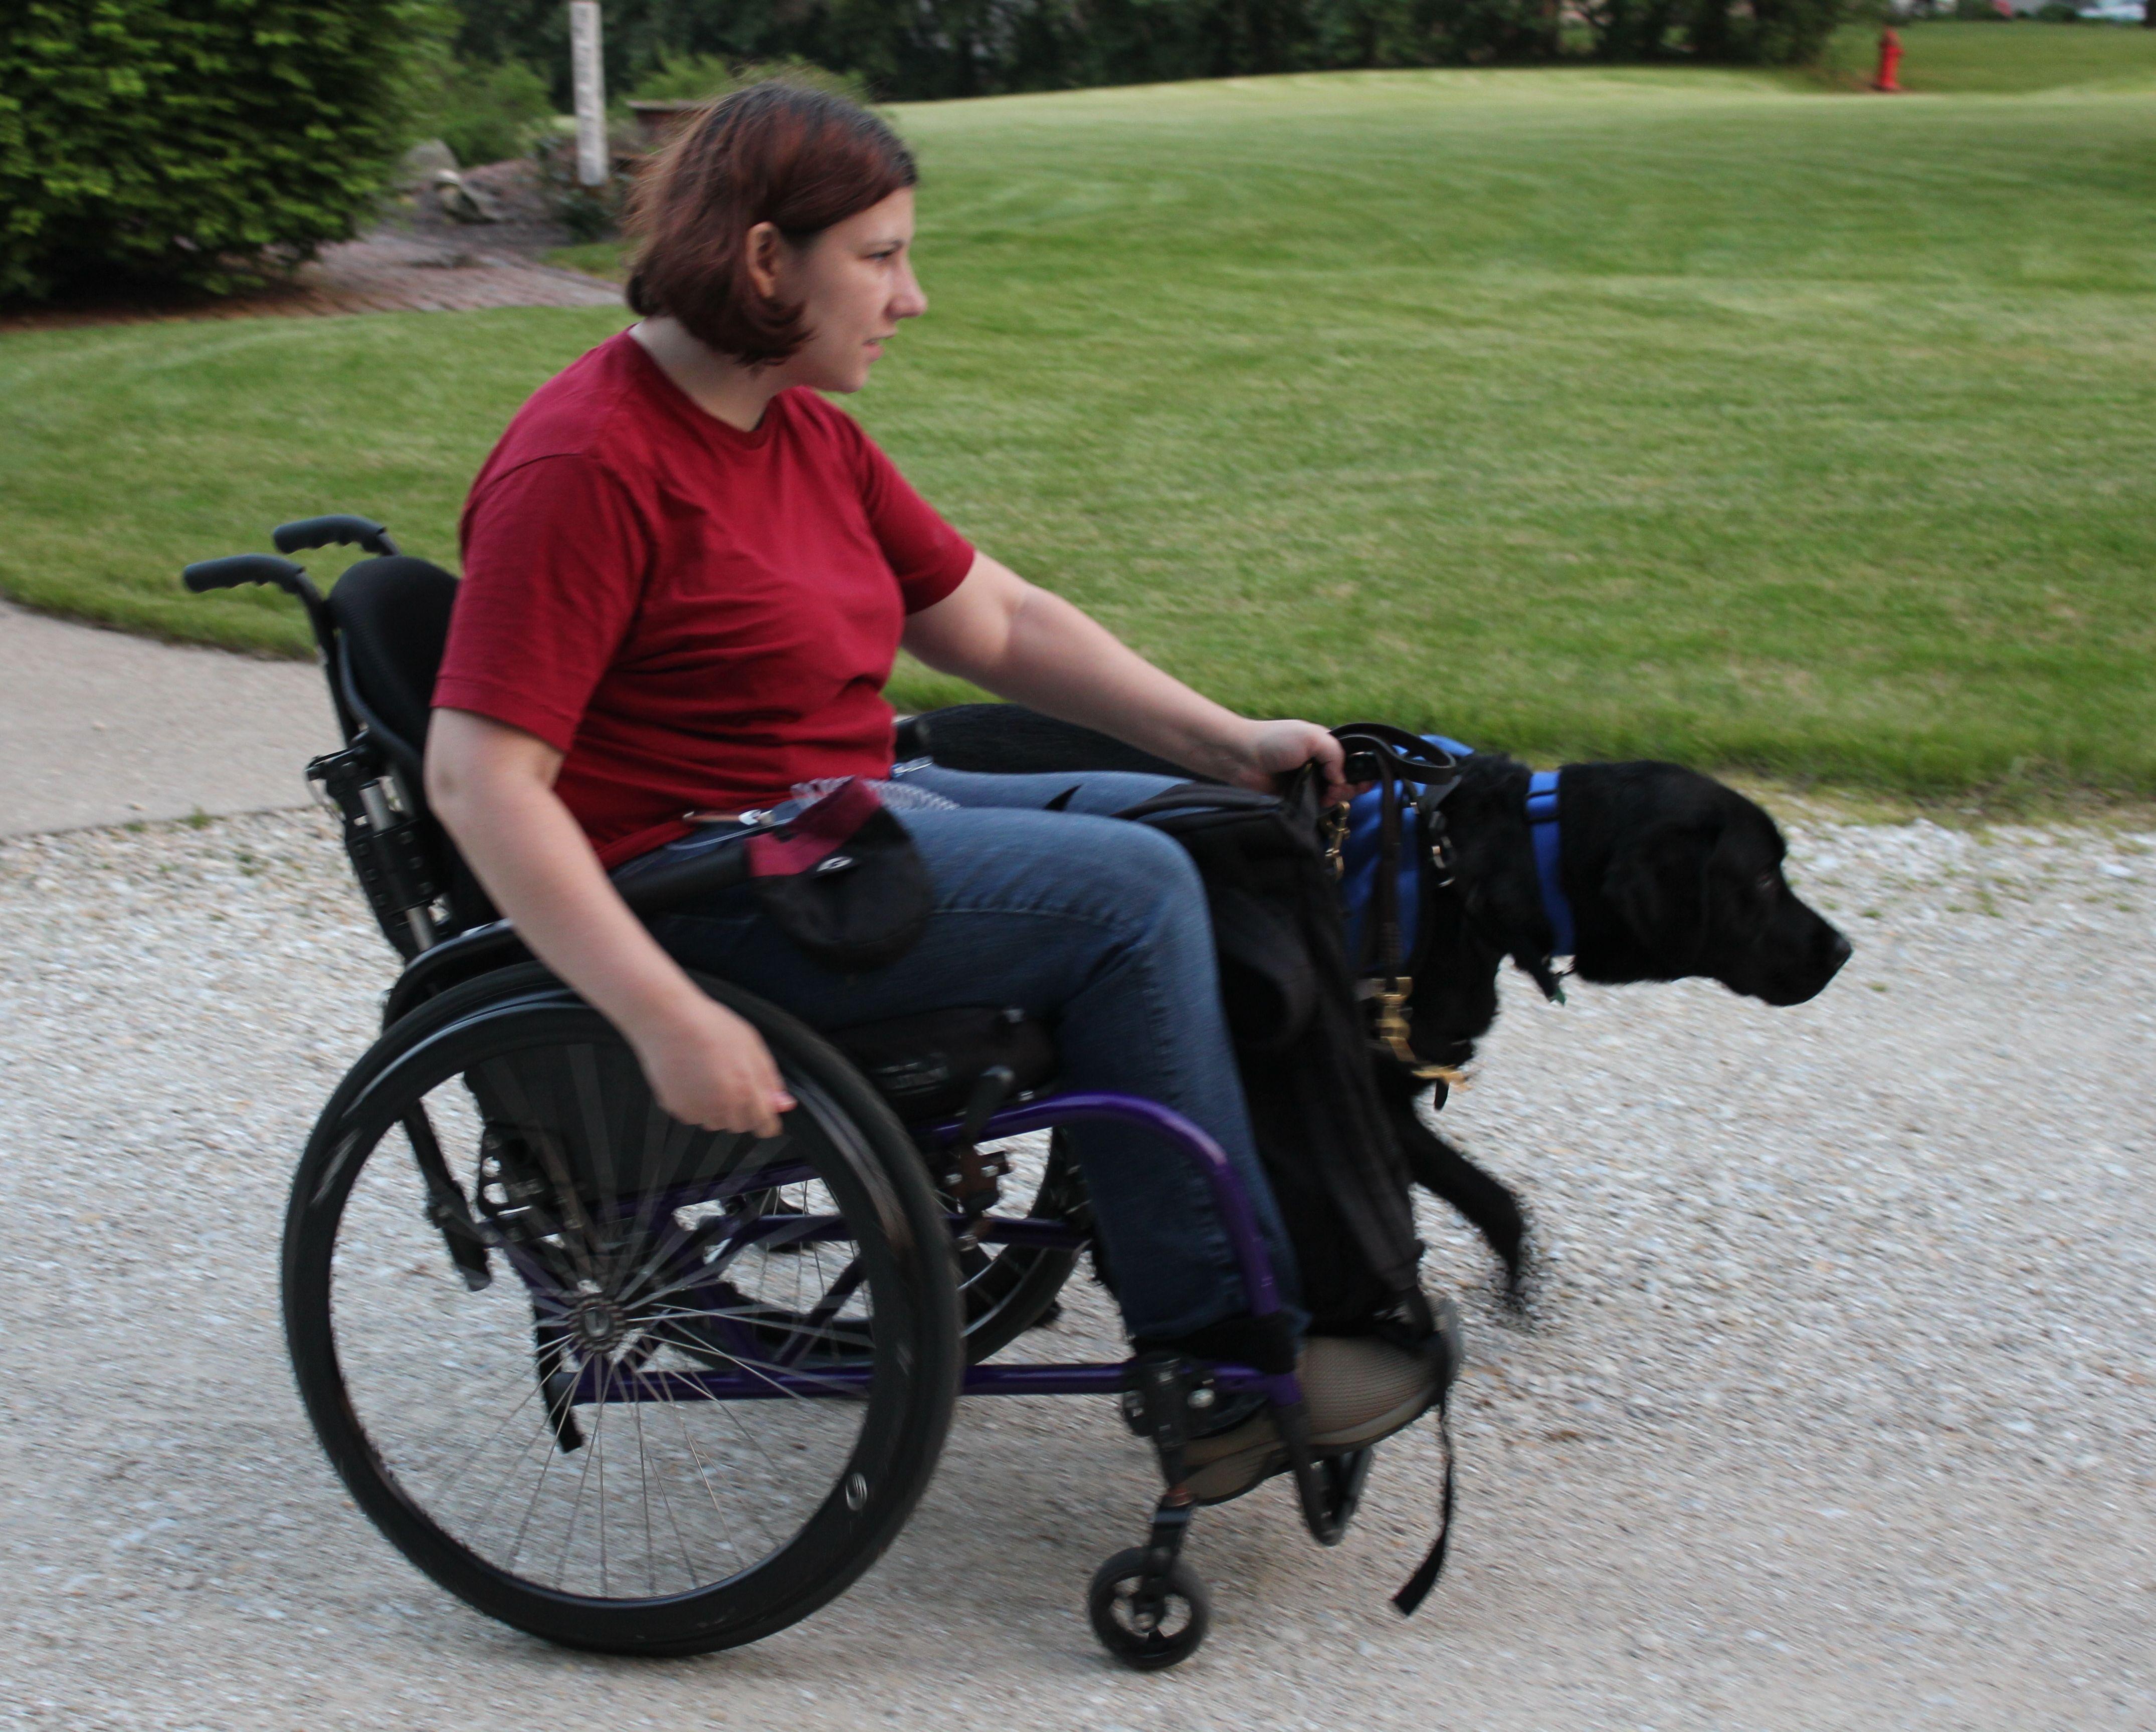 My service dog, Herbie, pulling my wheelchair. Dog